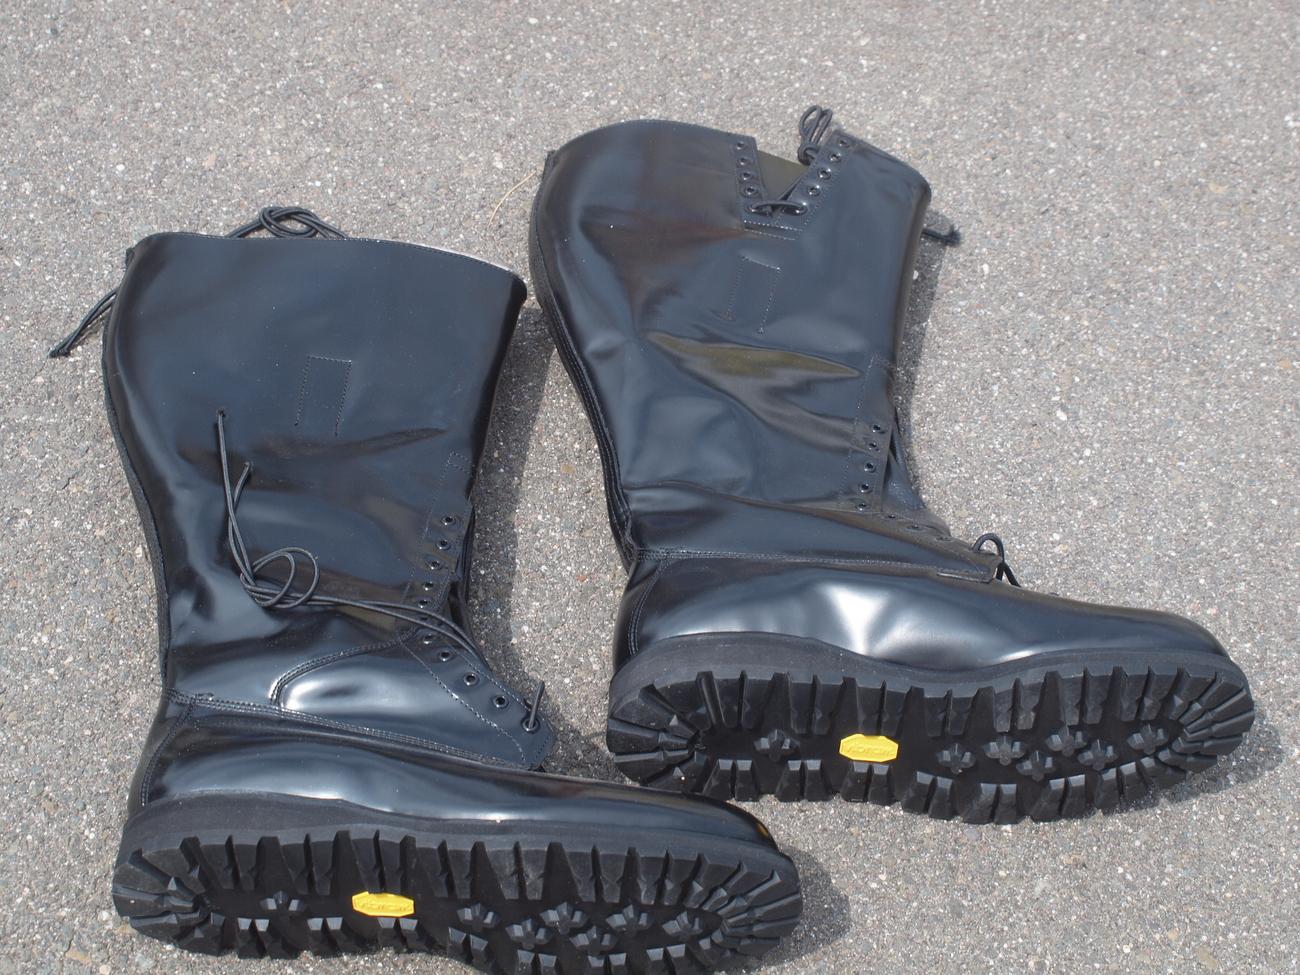 Official alden police motorcycle boots 10 eeeee boots Police motor boots